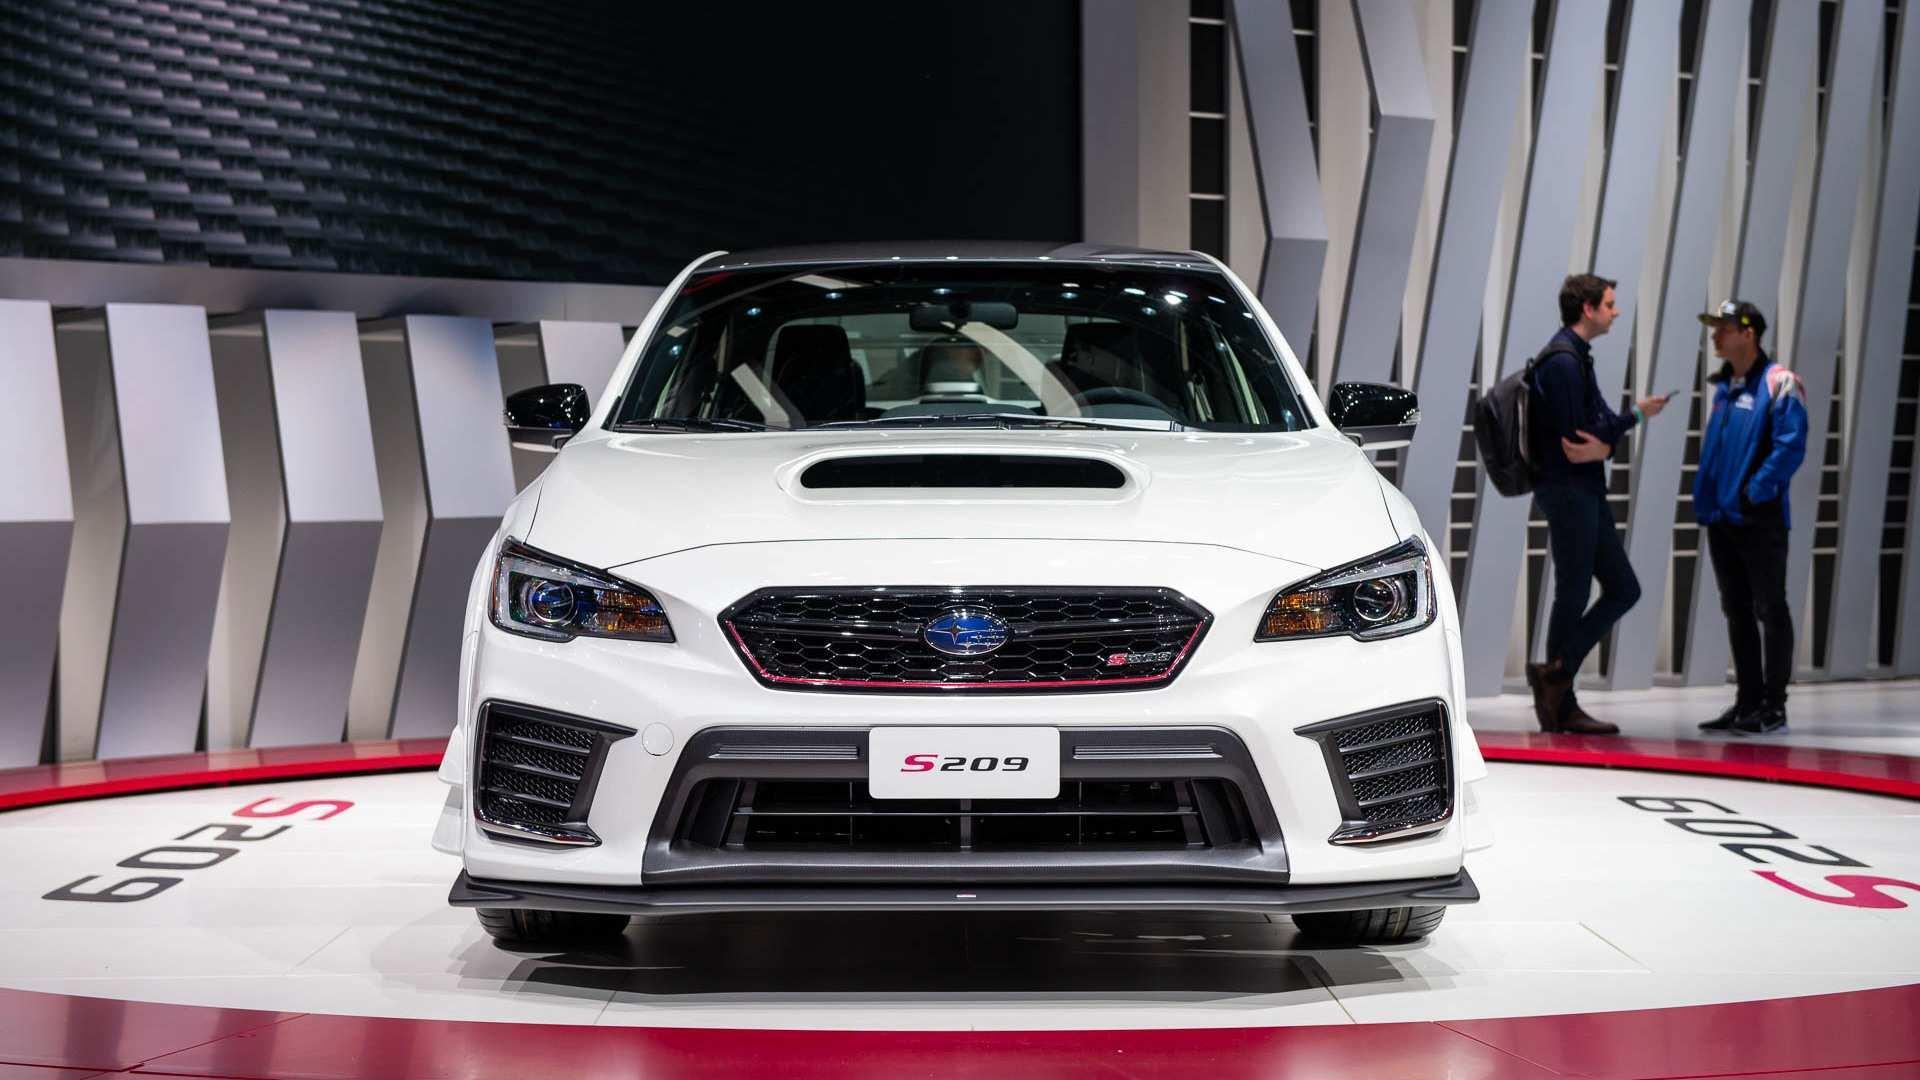 98 All New 2020 Subaru Wrx Series Gray History for 2020 Subaru Wrx Series Gray